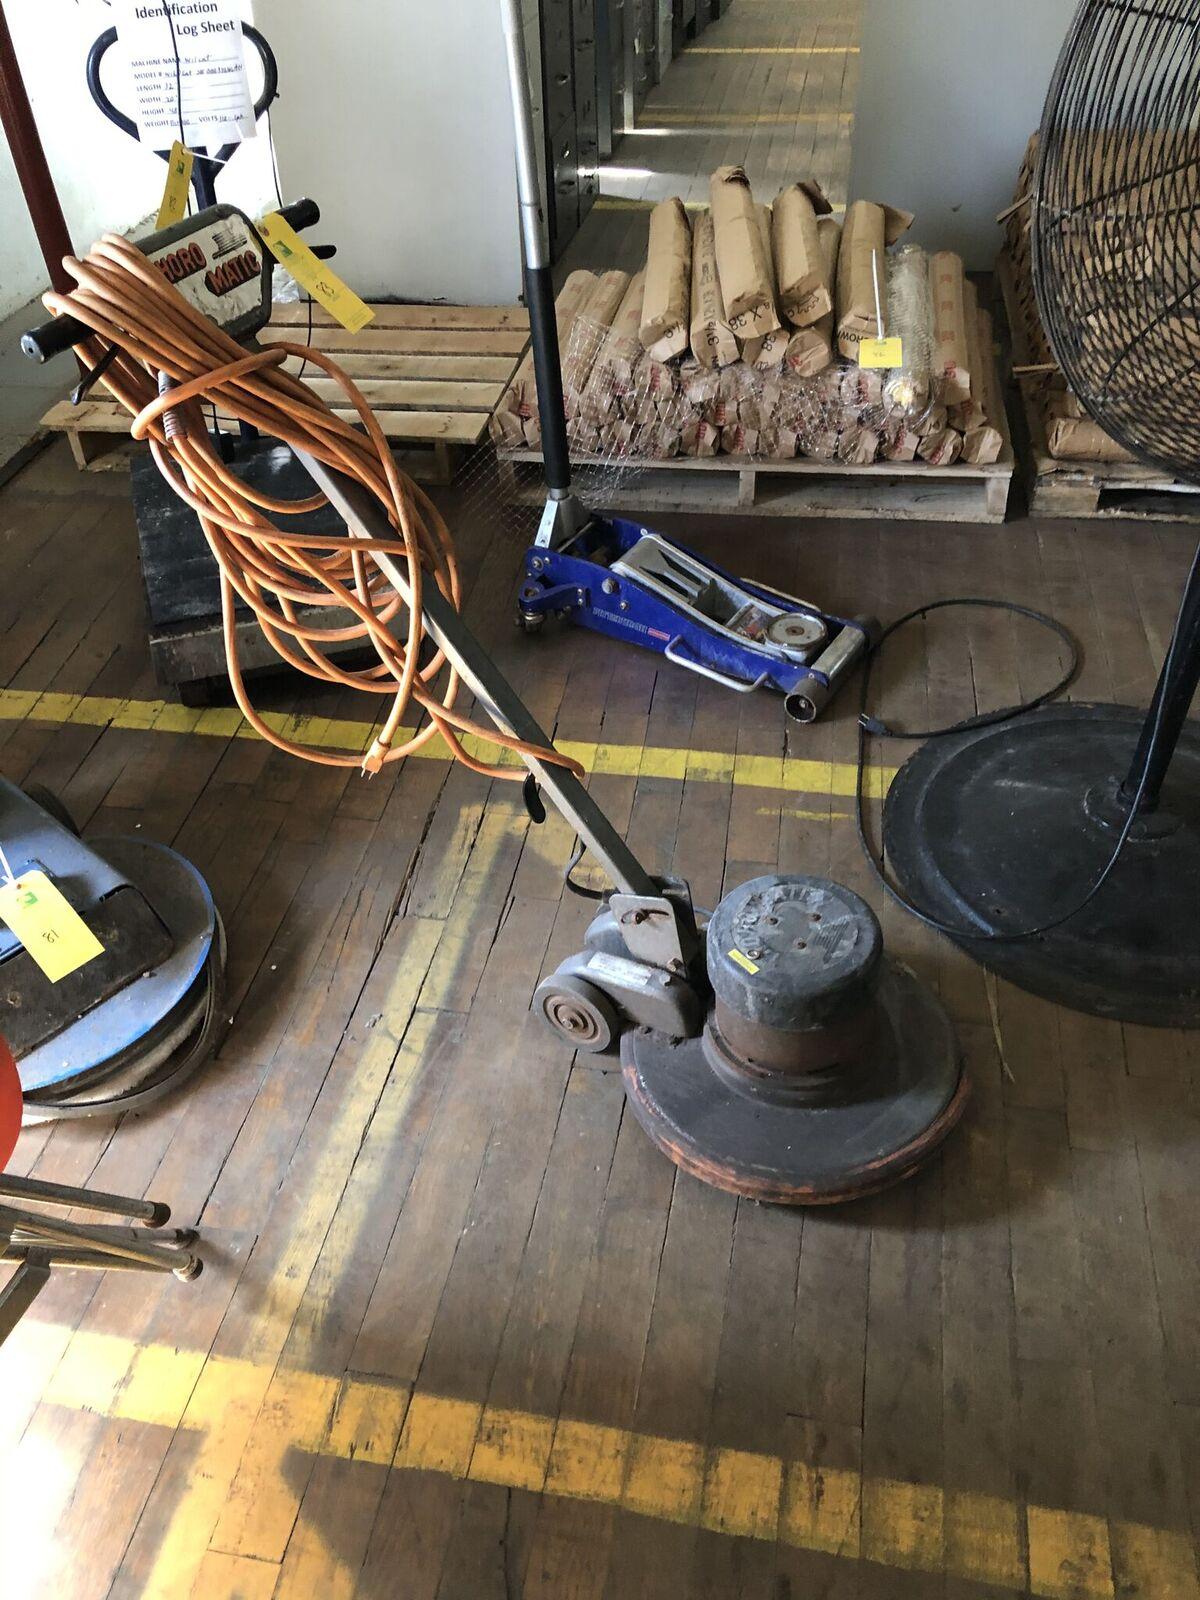 Lot 83 - Thoro Matic Floor Scrubber